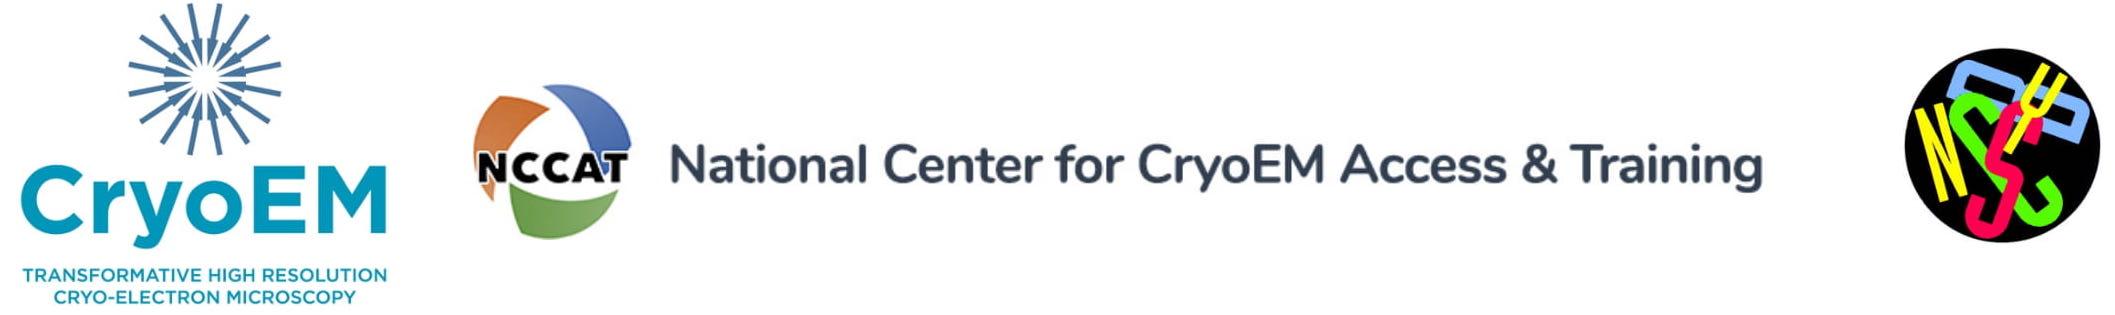 NCCAT Logo